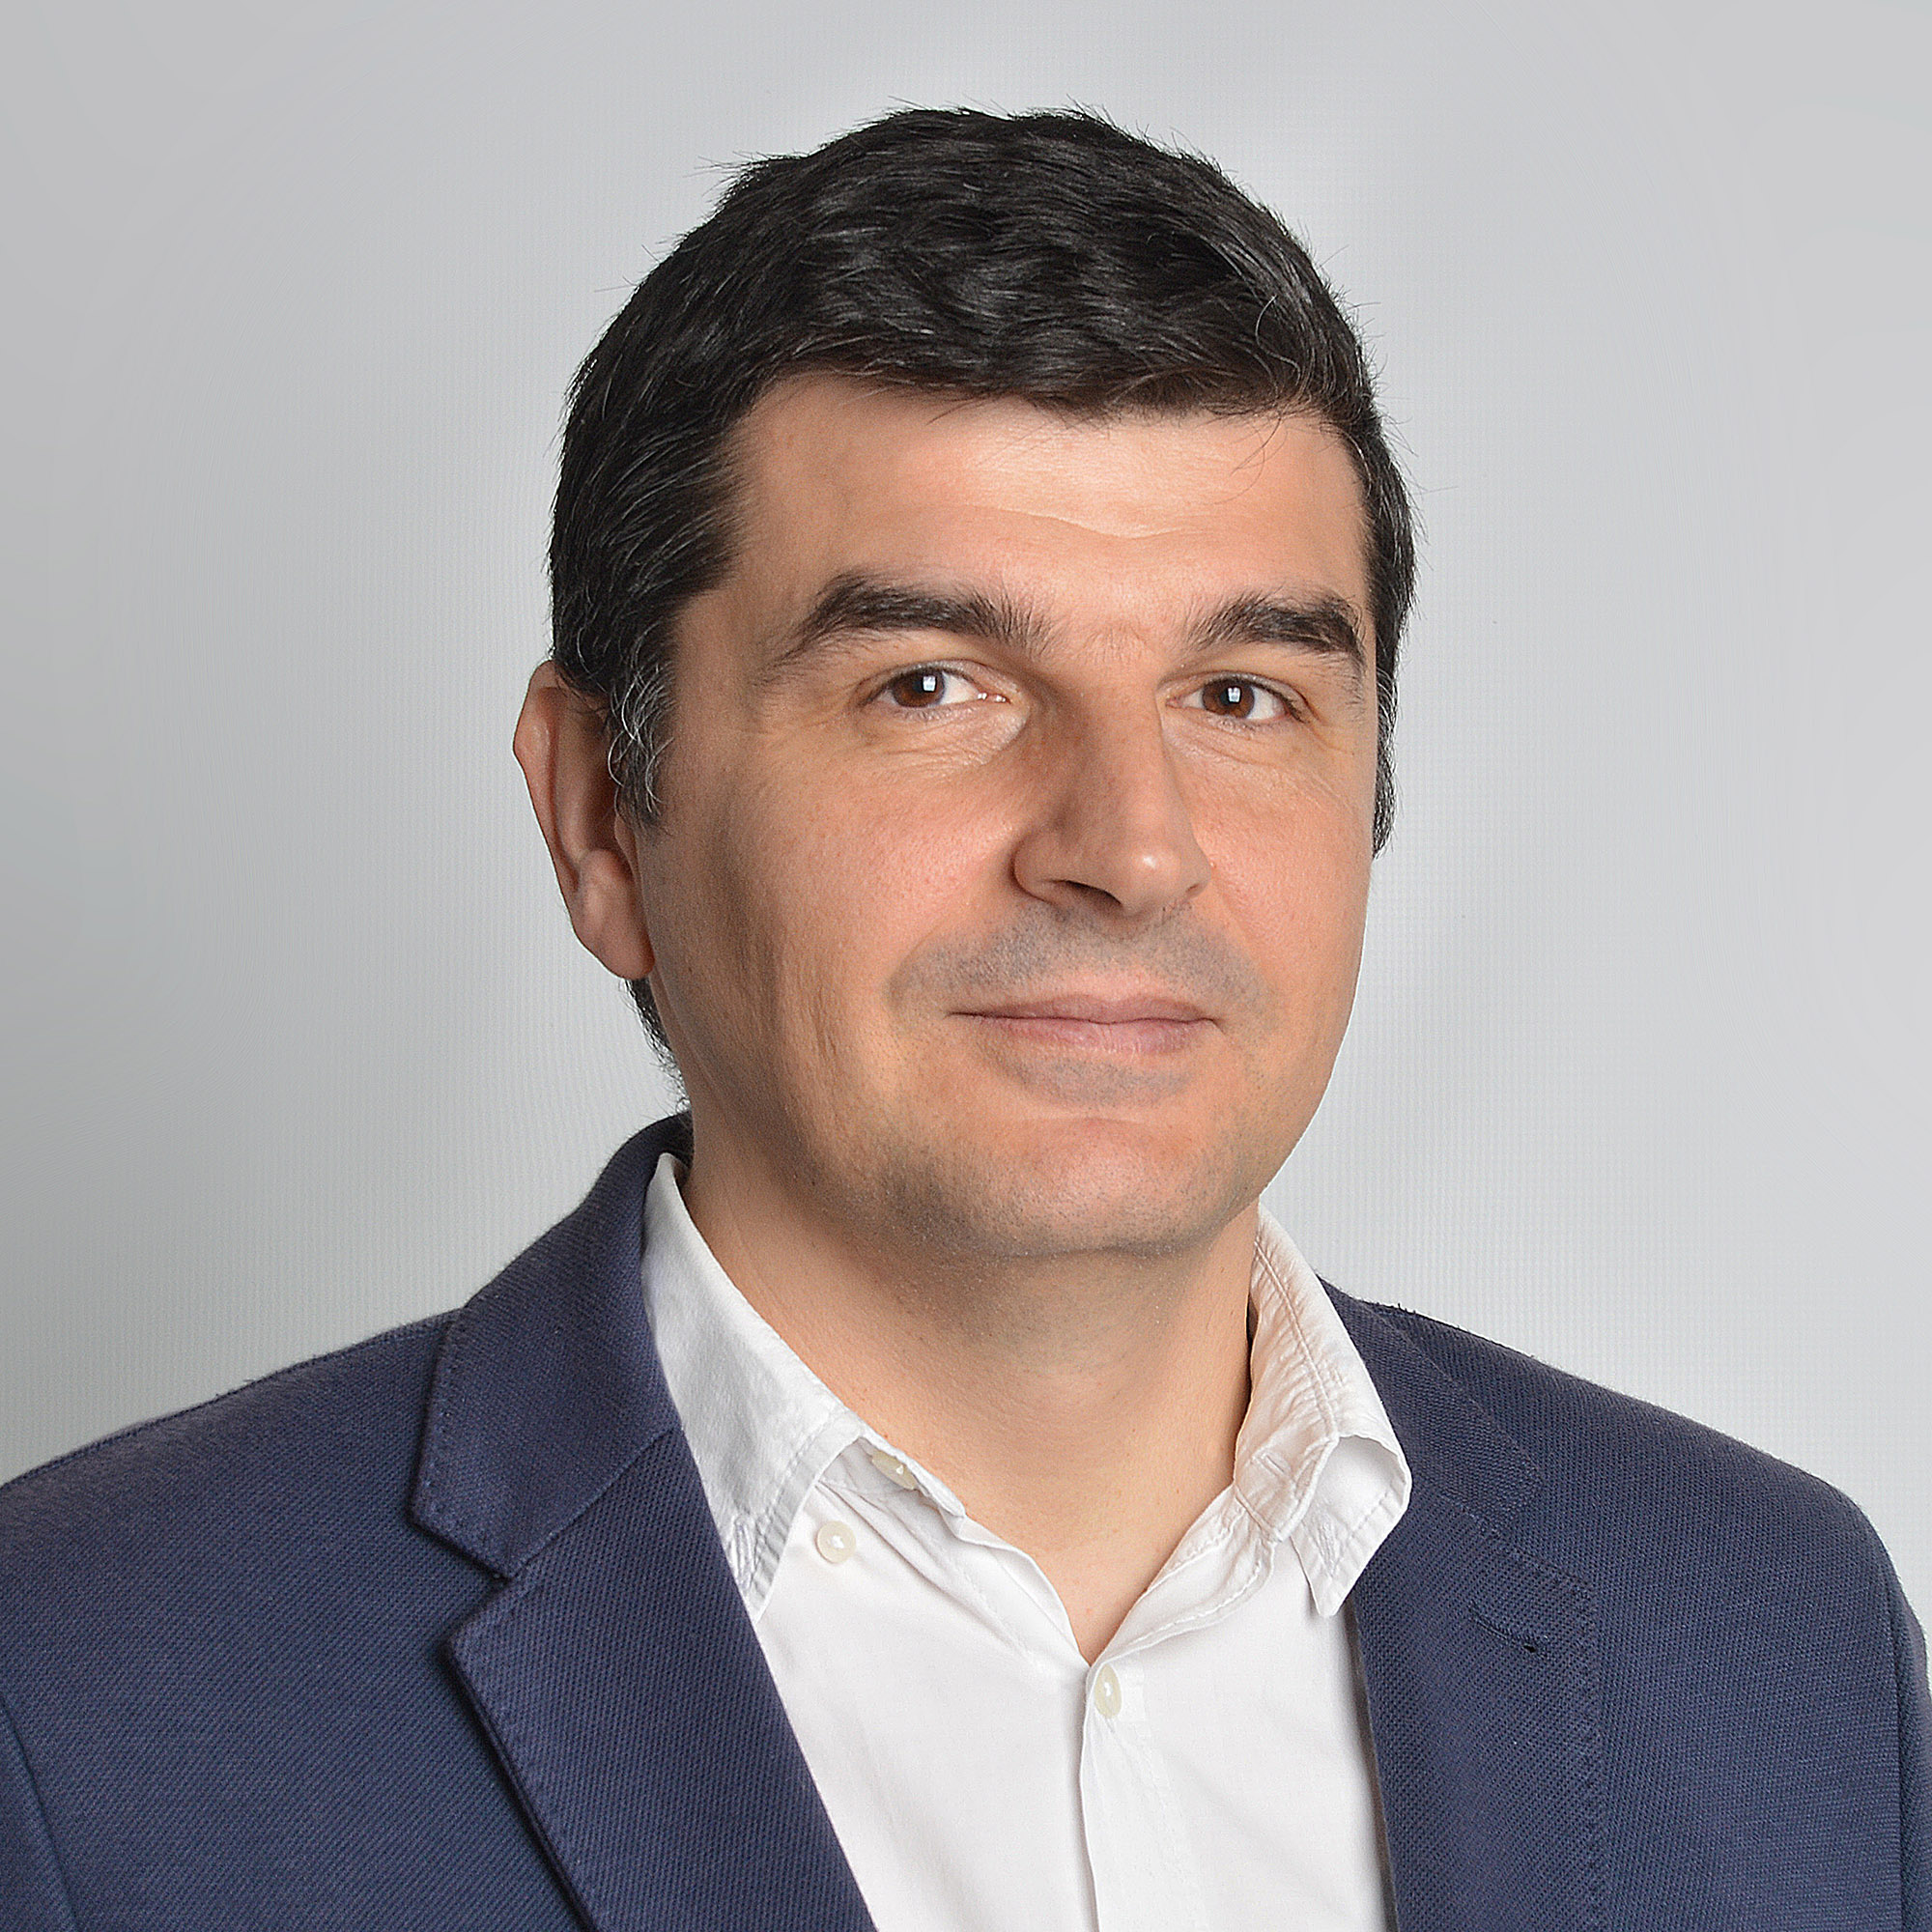 Horațiu-Mihai RUSU